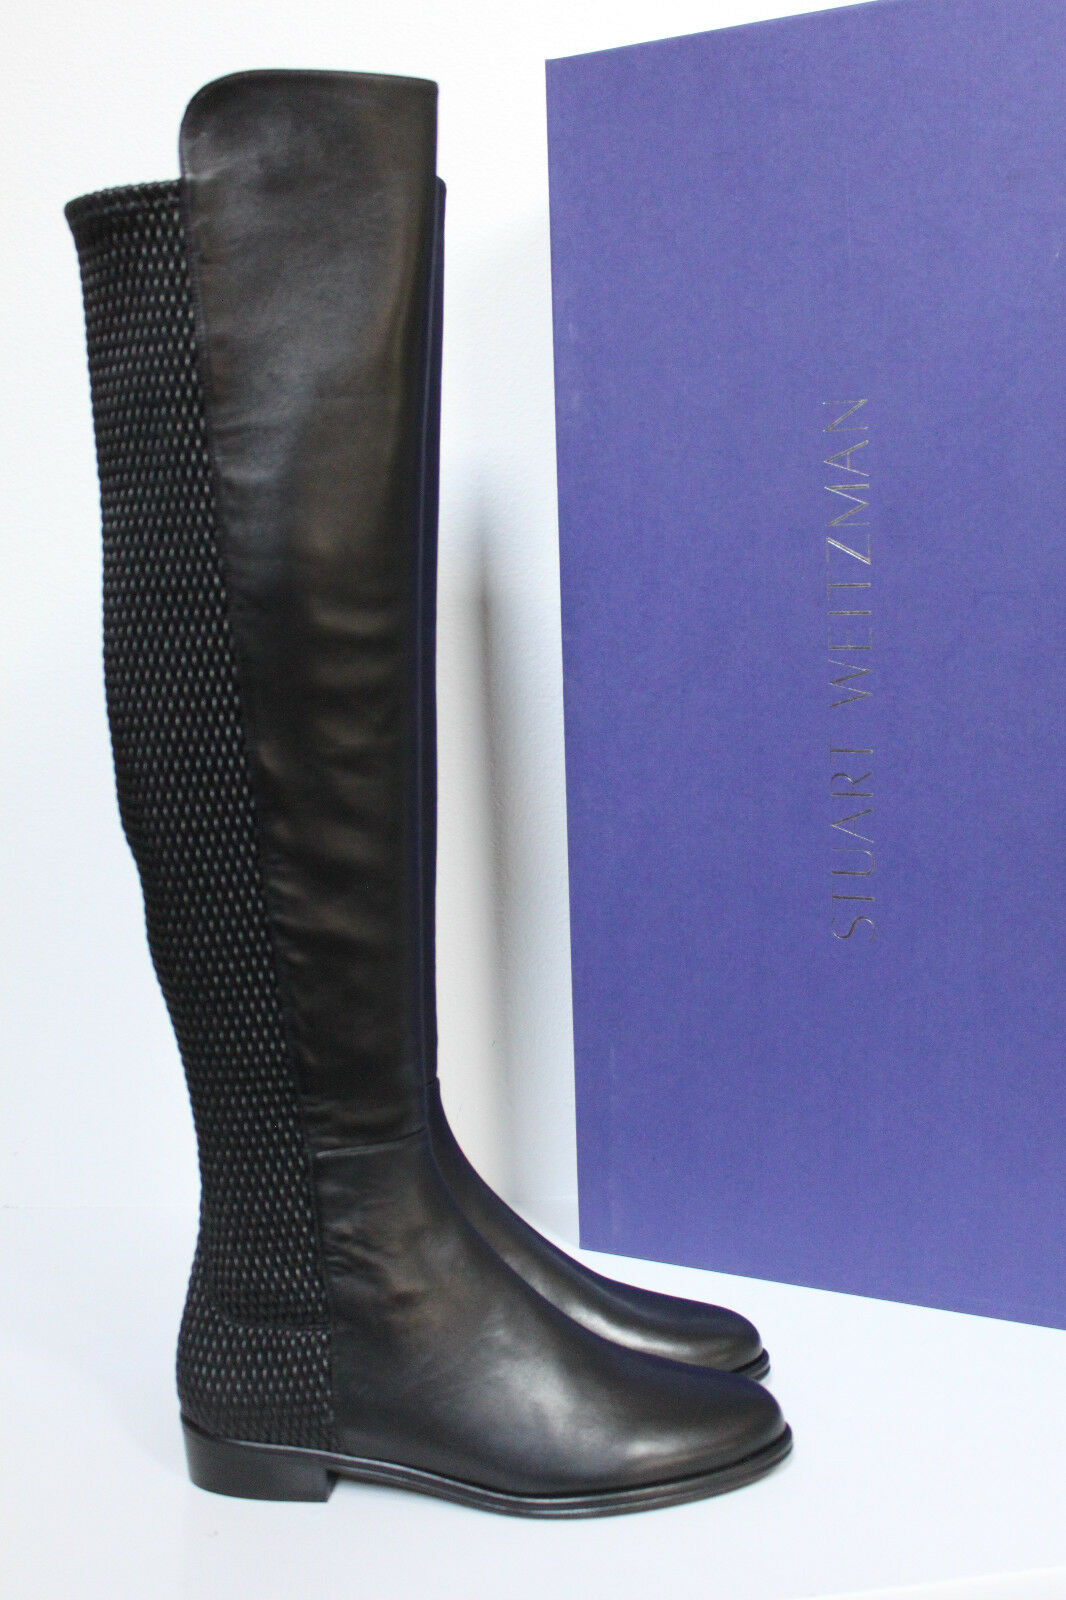 New sz 7 M Stuart Weitzman Black Leather Alljenn Over the Knee Tall Boot Shoes